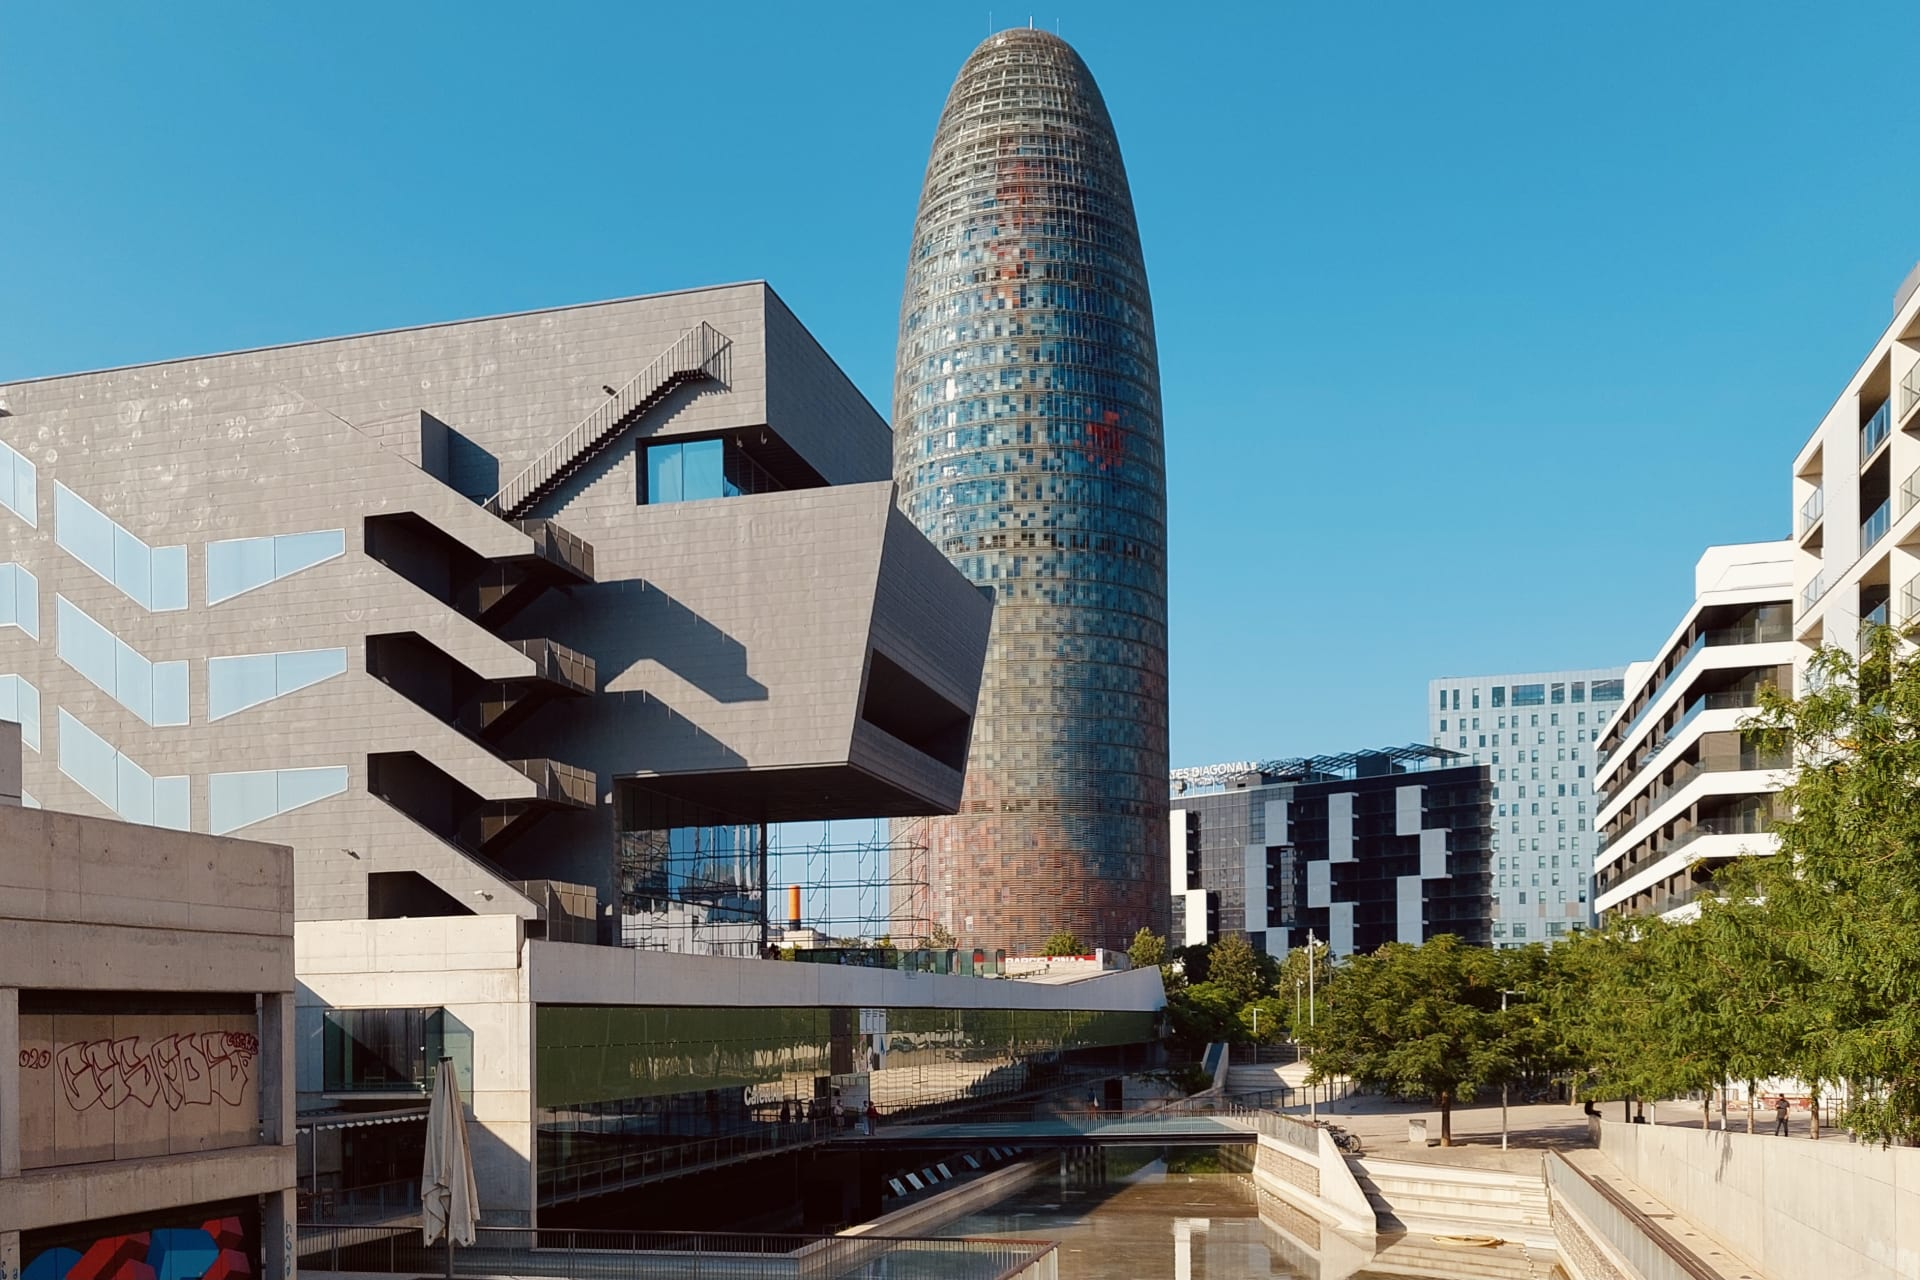 Barcelona - Barcelona Poblenou District: Tradition and Innovation